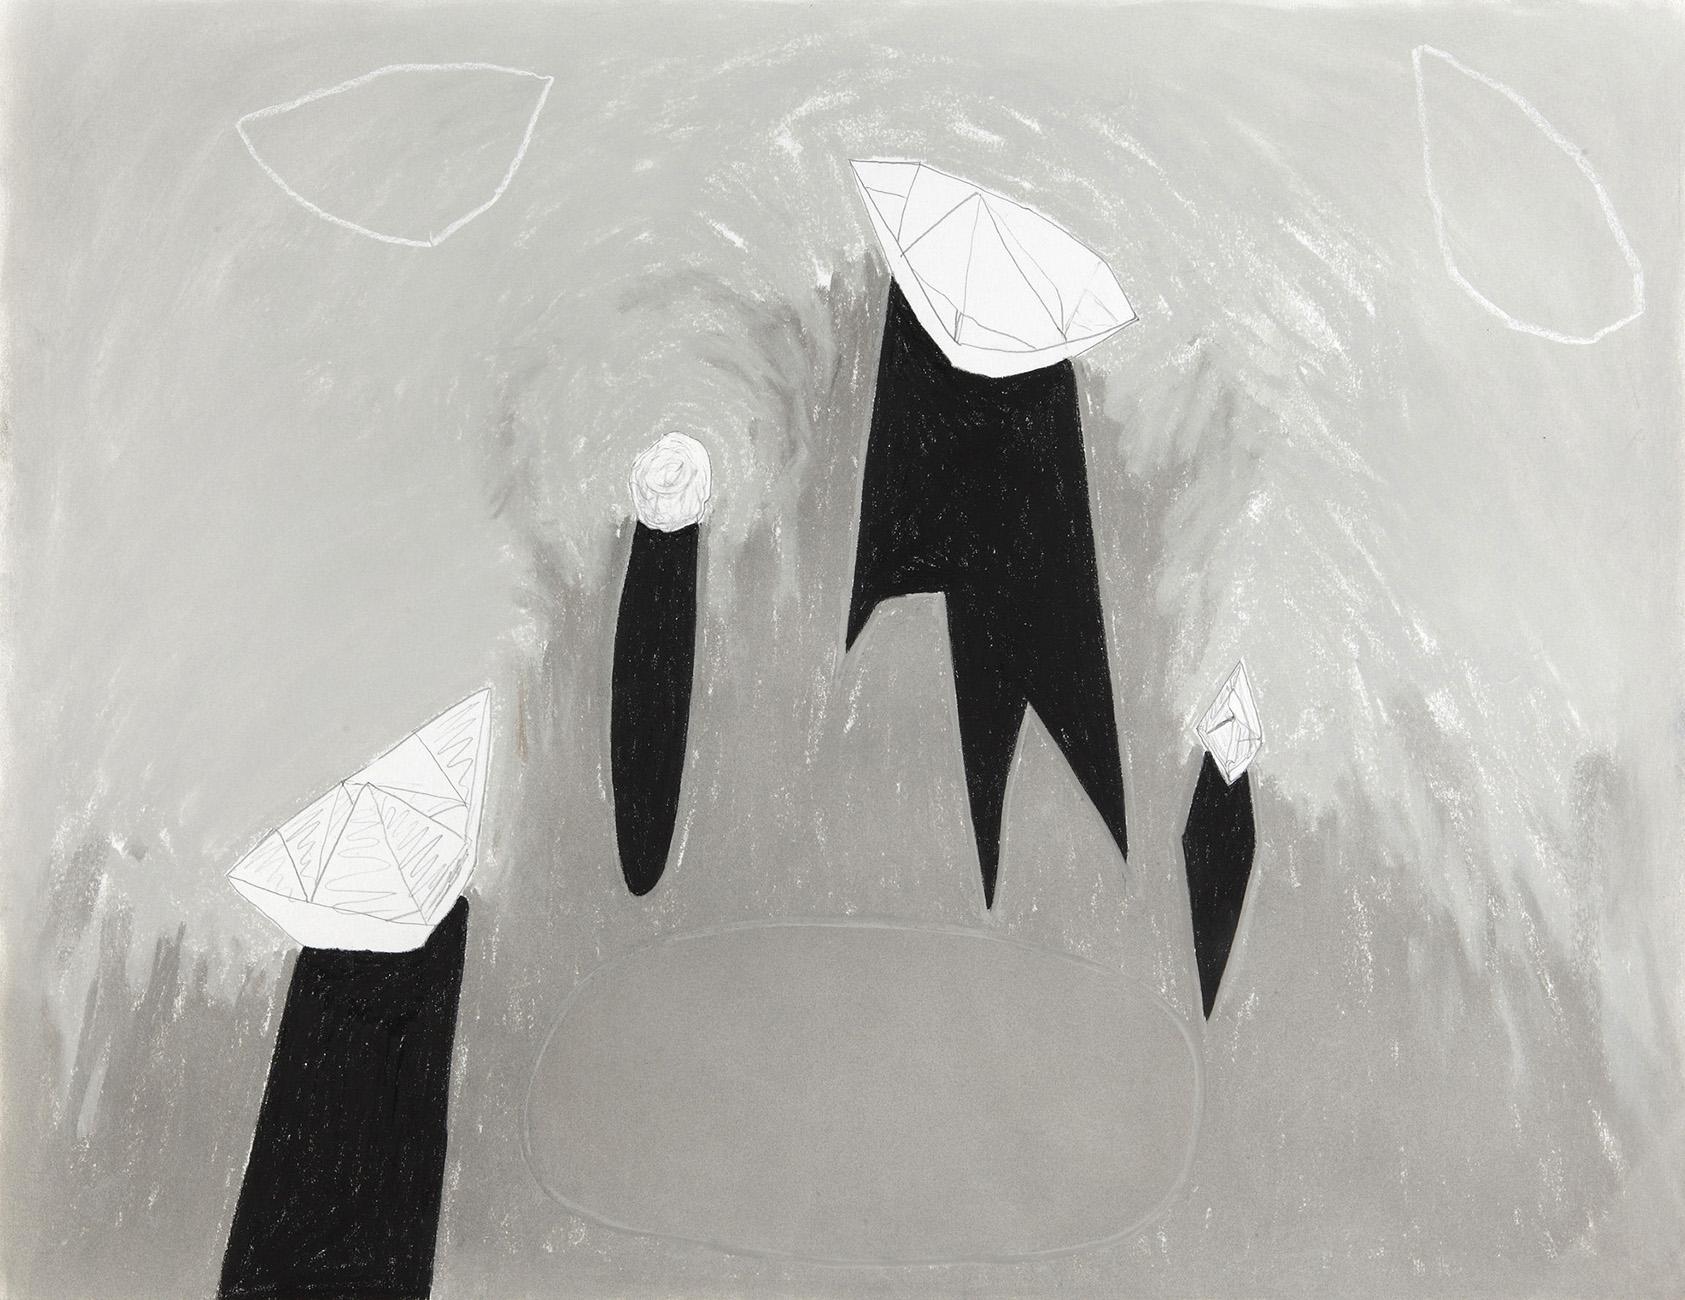 Akkrum 2 -  potlood & pastelkrijt  -  50x70 cm - verkocht